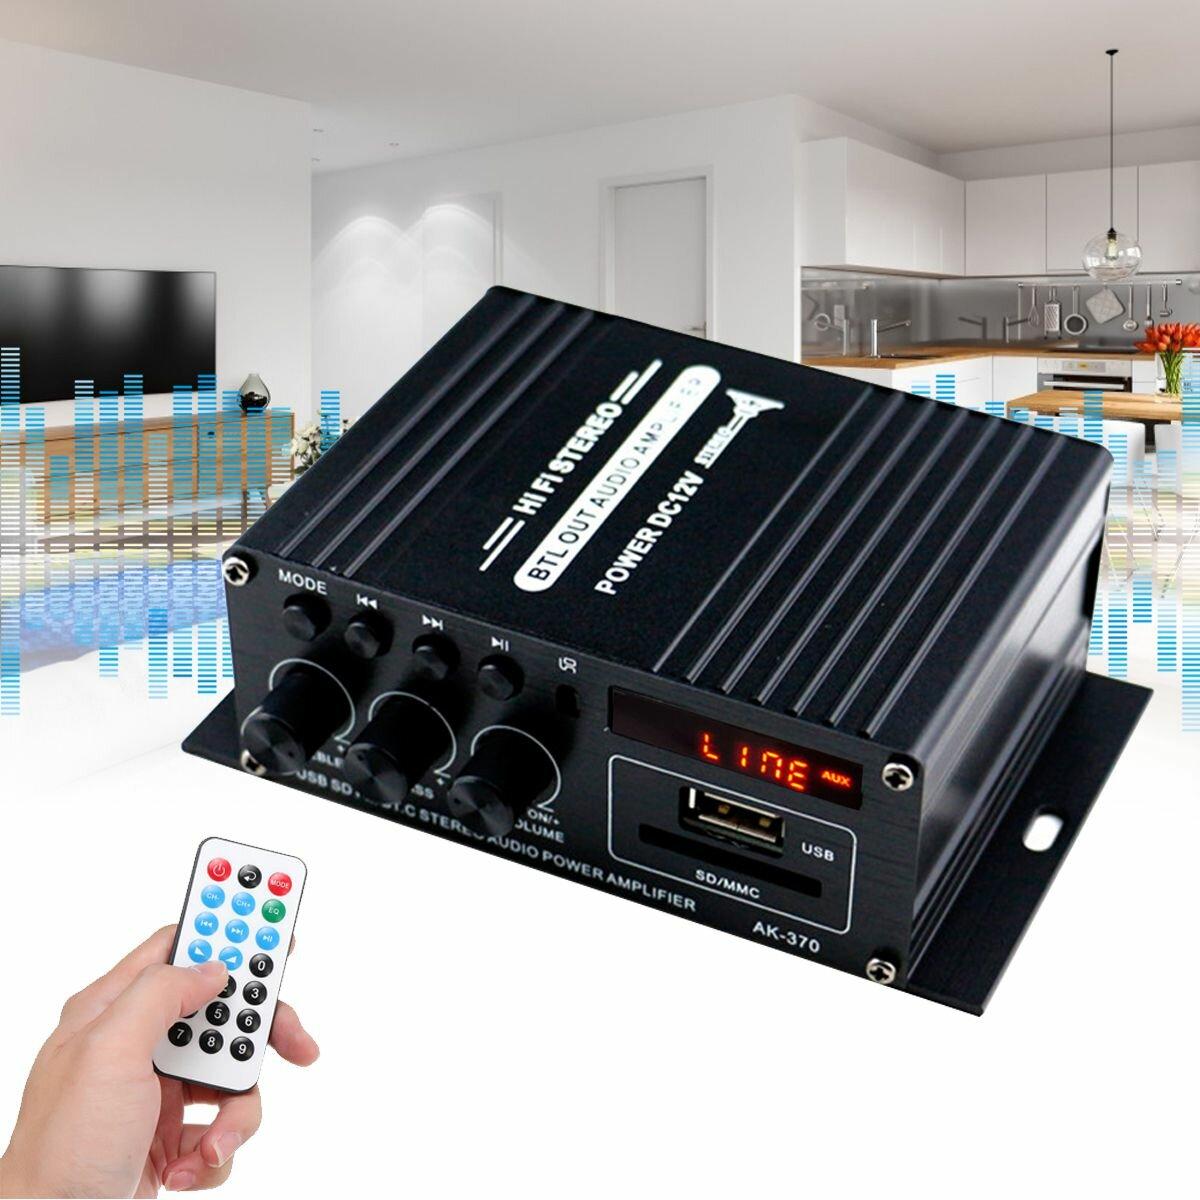 AK370 400 W DC 12 V / AC 220 V Uzakdan Kumanda bluetooth HiFi Ev araba Stereo Amplifikatör Müzik Alıcı FM Radyo 20Hz-20 KHz